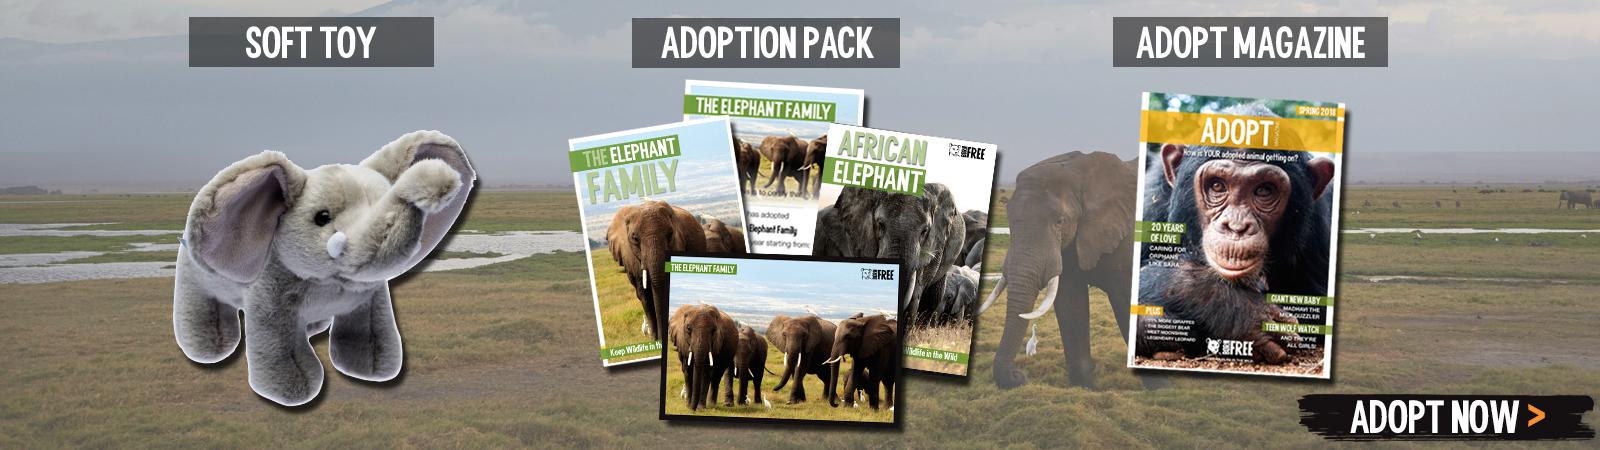 Sponsor a Elephant